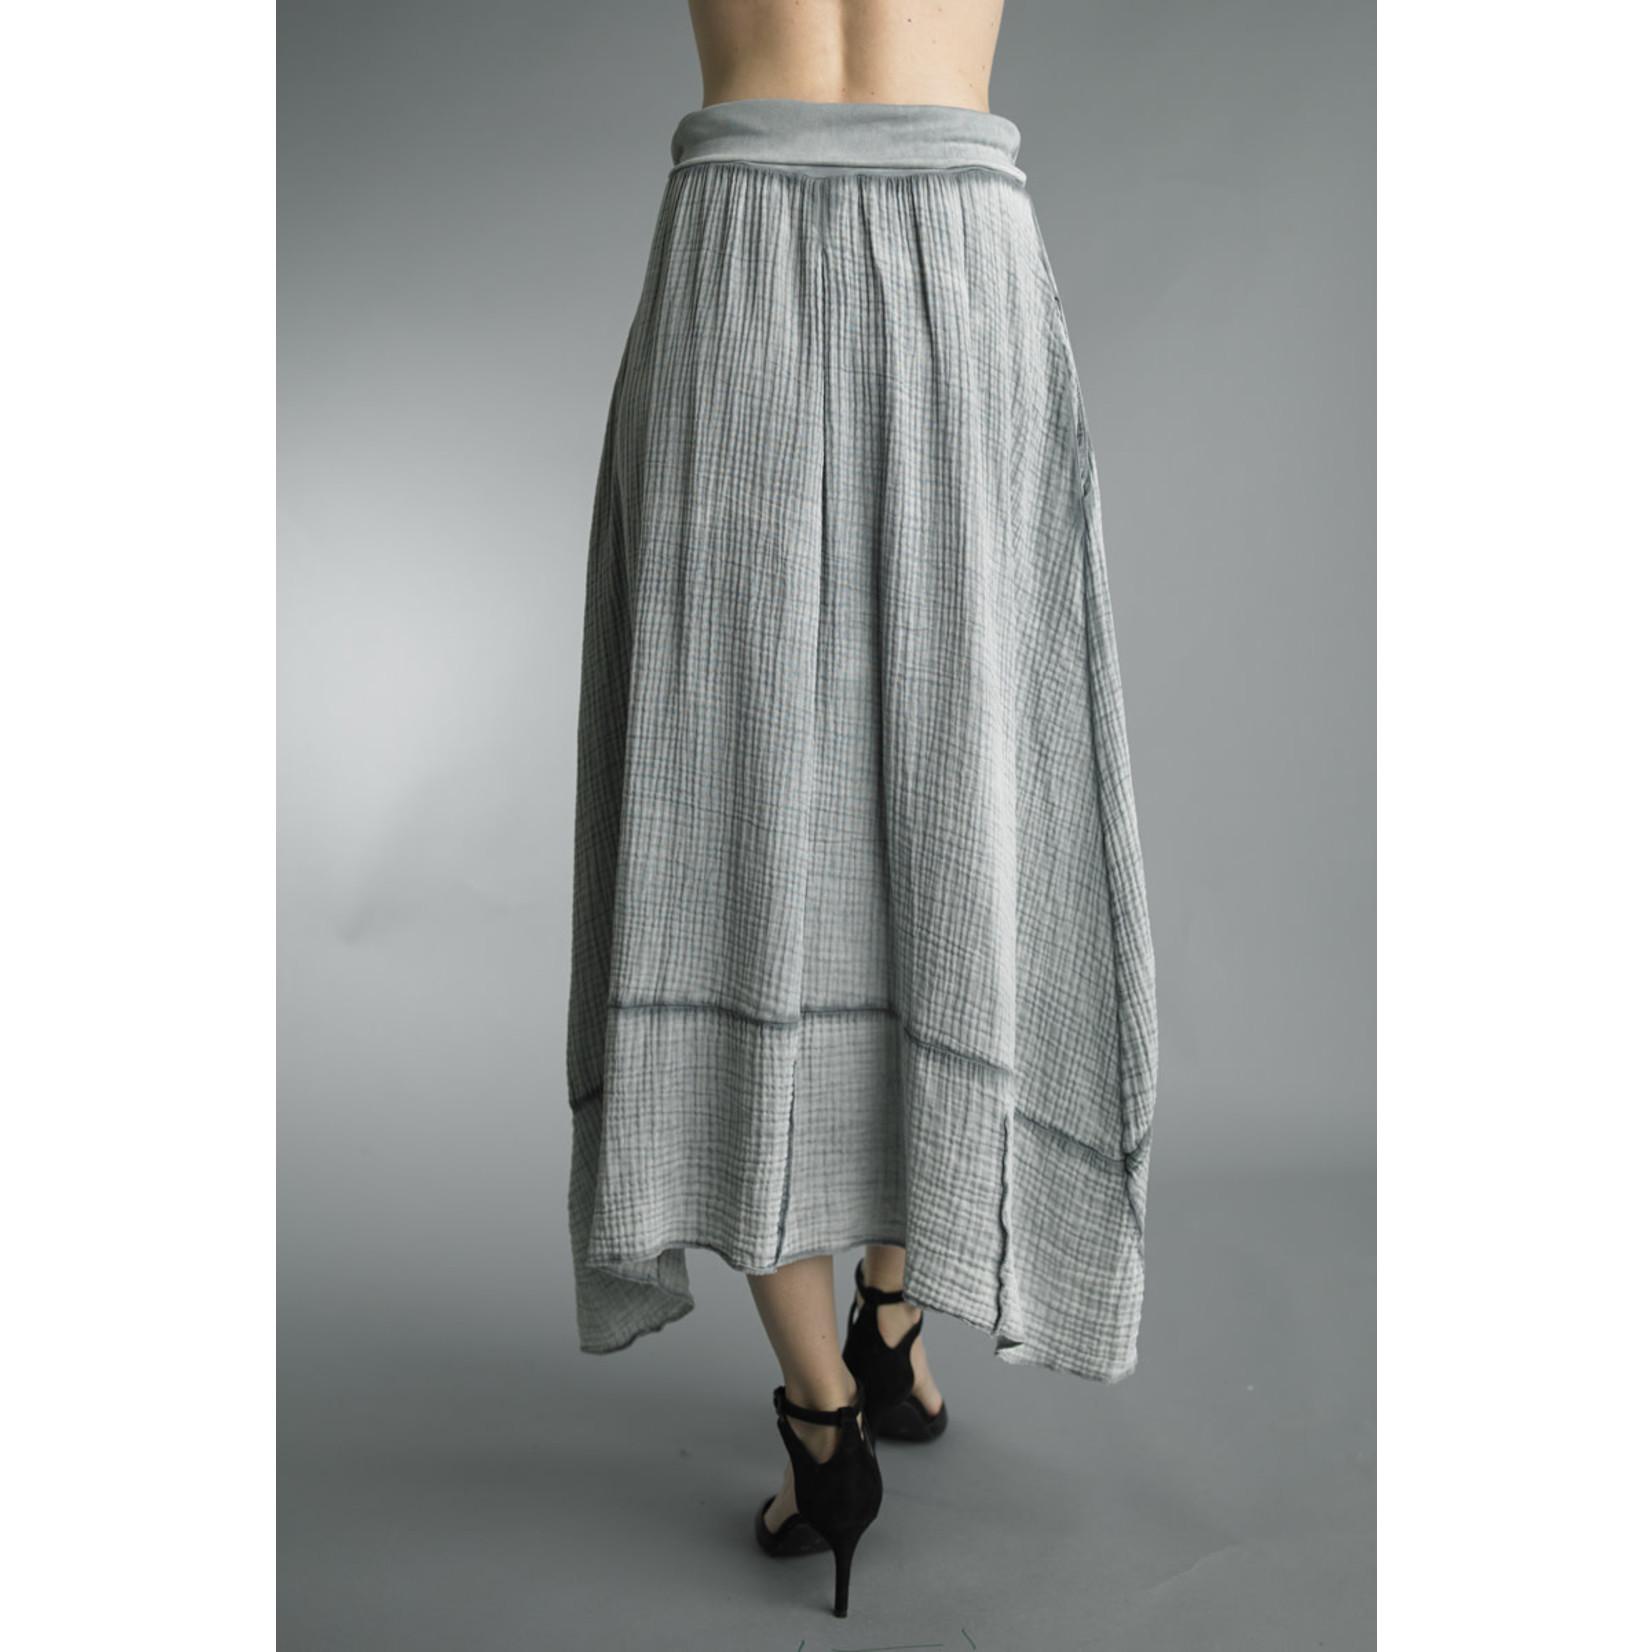 Tempo Paris Grey Long Skirt w/ Wide Elastic Waistband